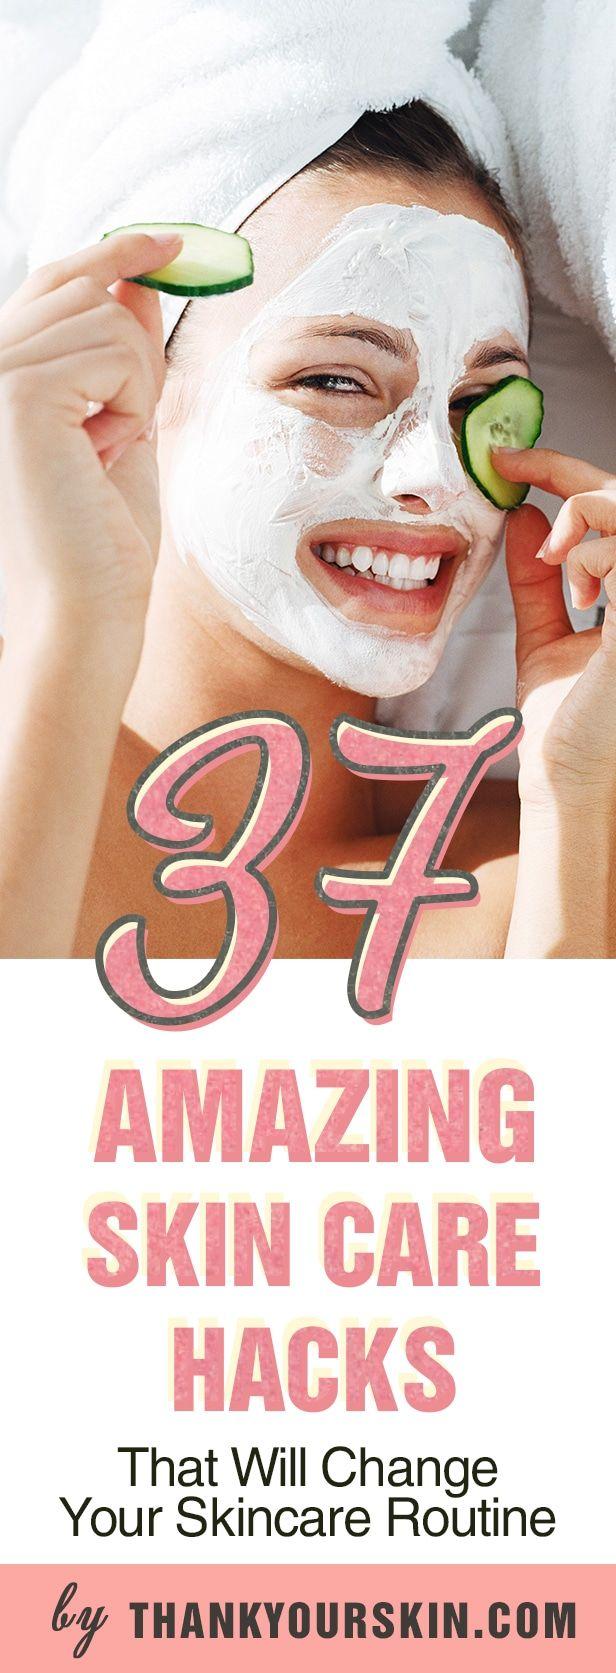 37 Amazing Skin Care Hacks